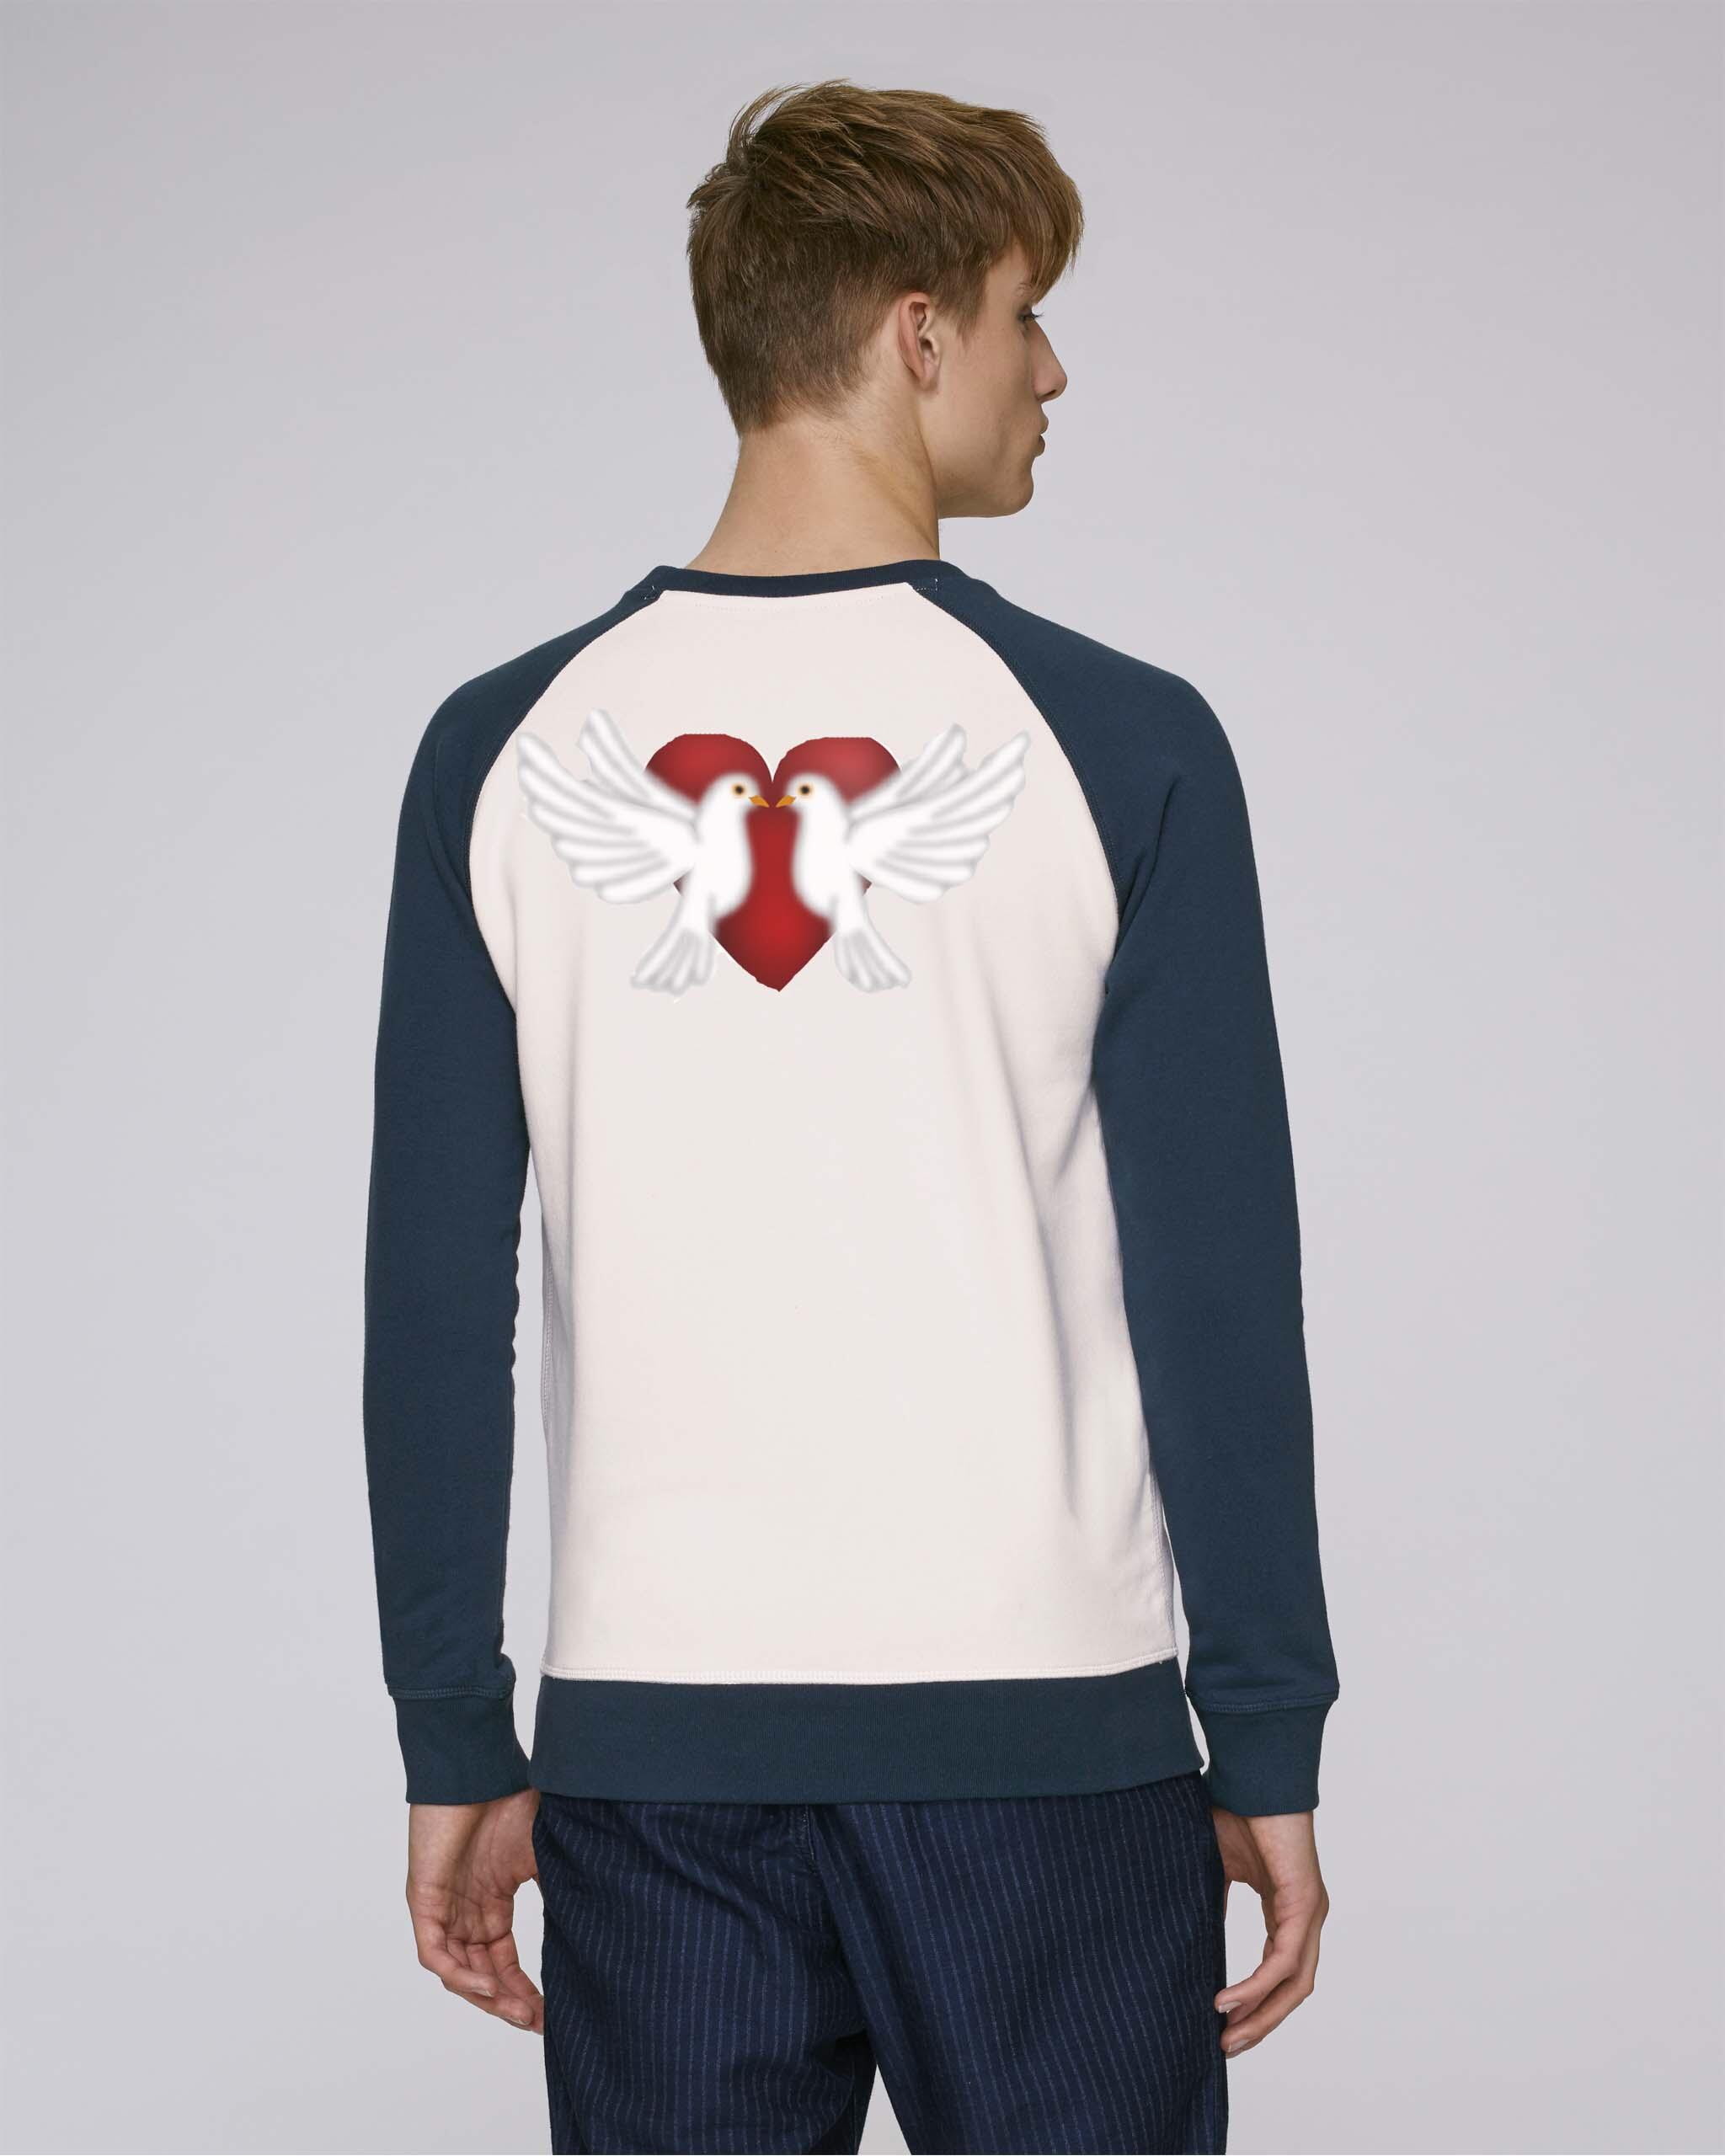 T-Shirt Bio Homme manche longue bleu - peace tee